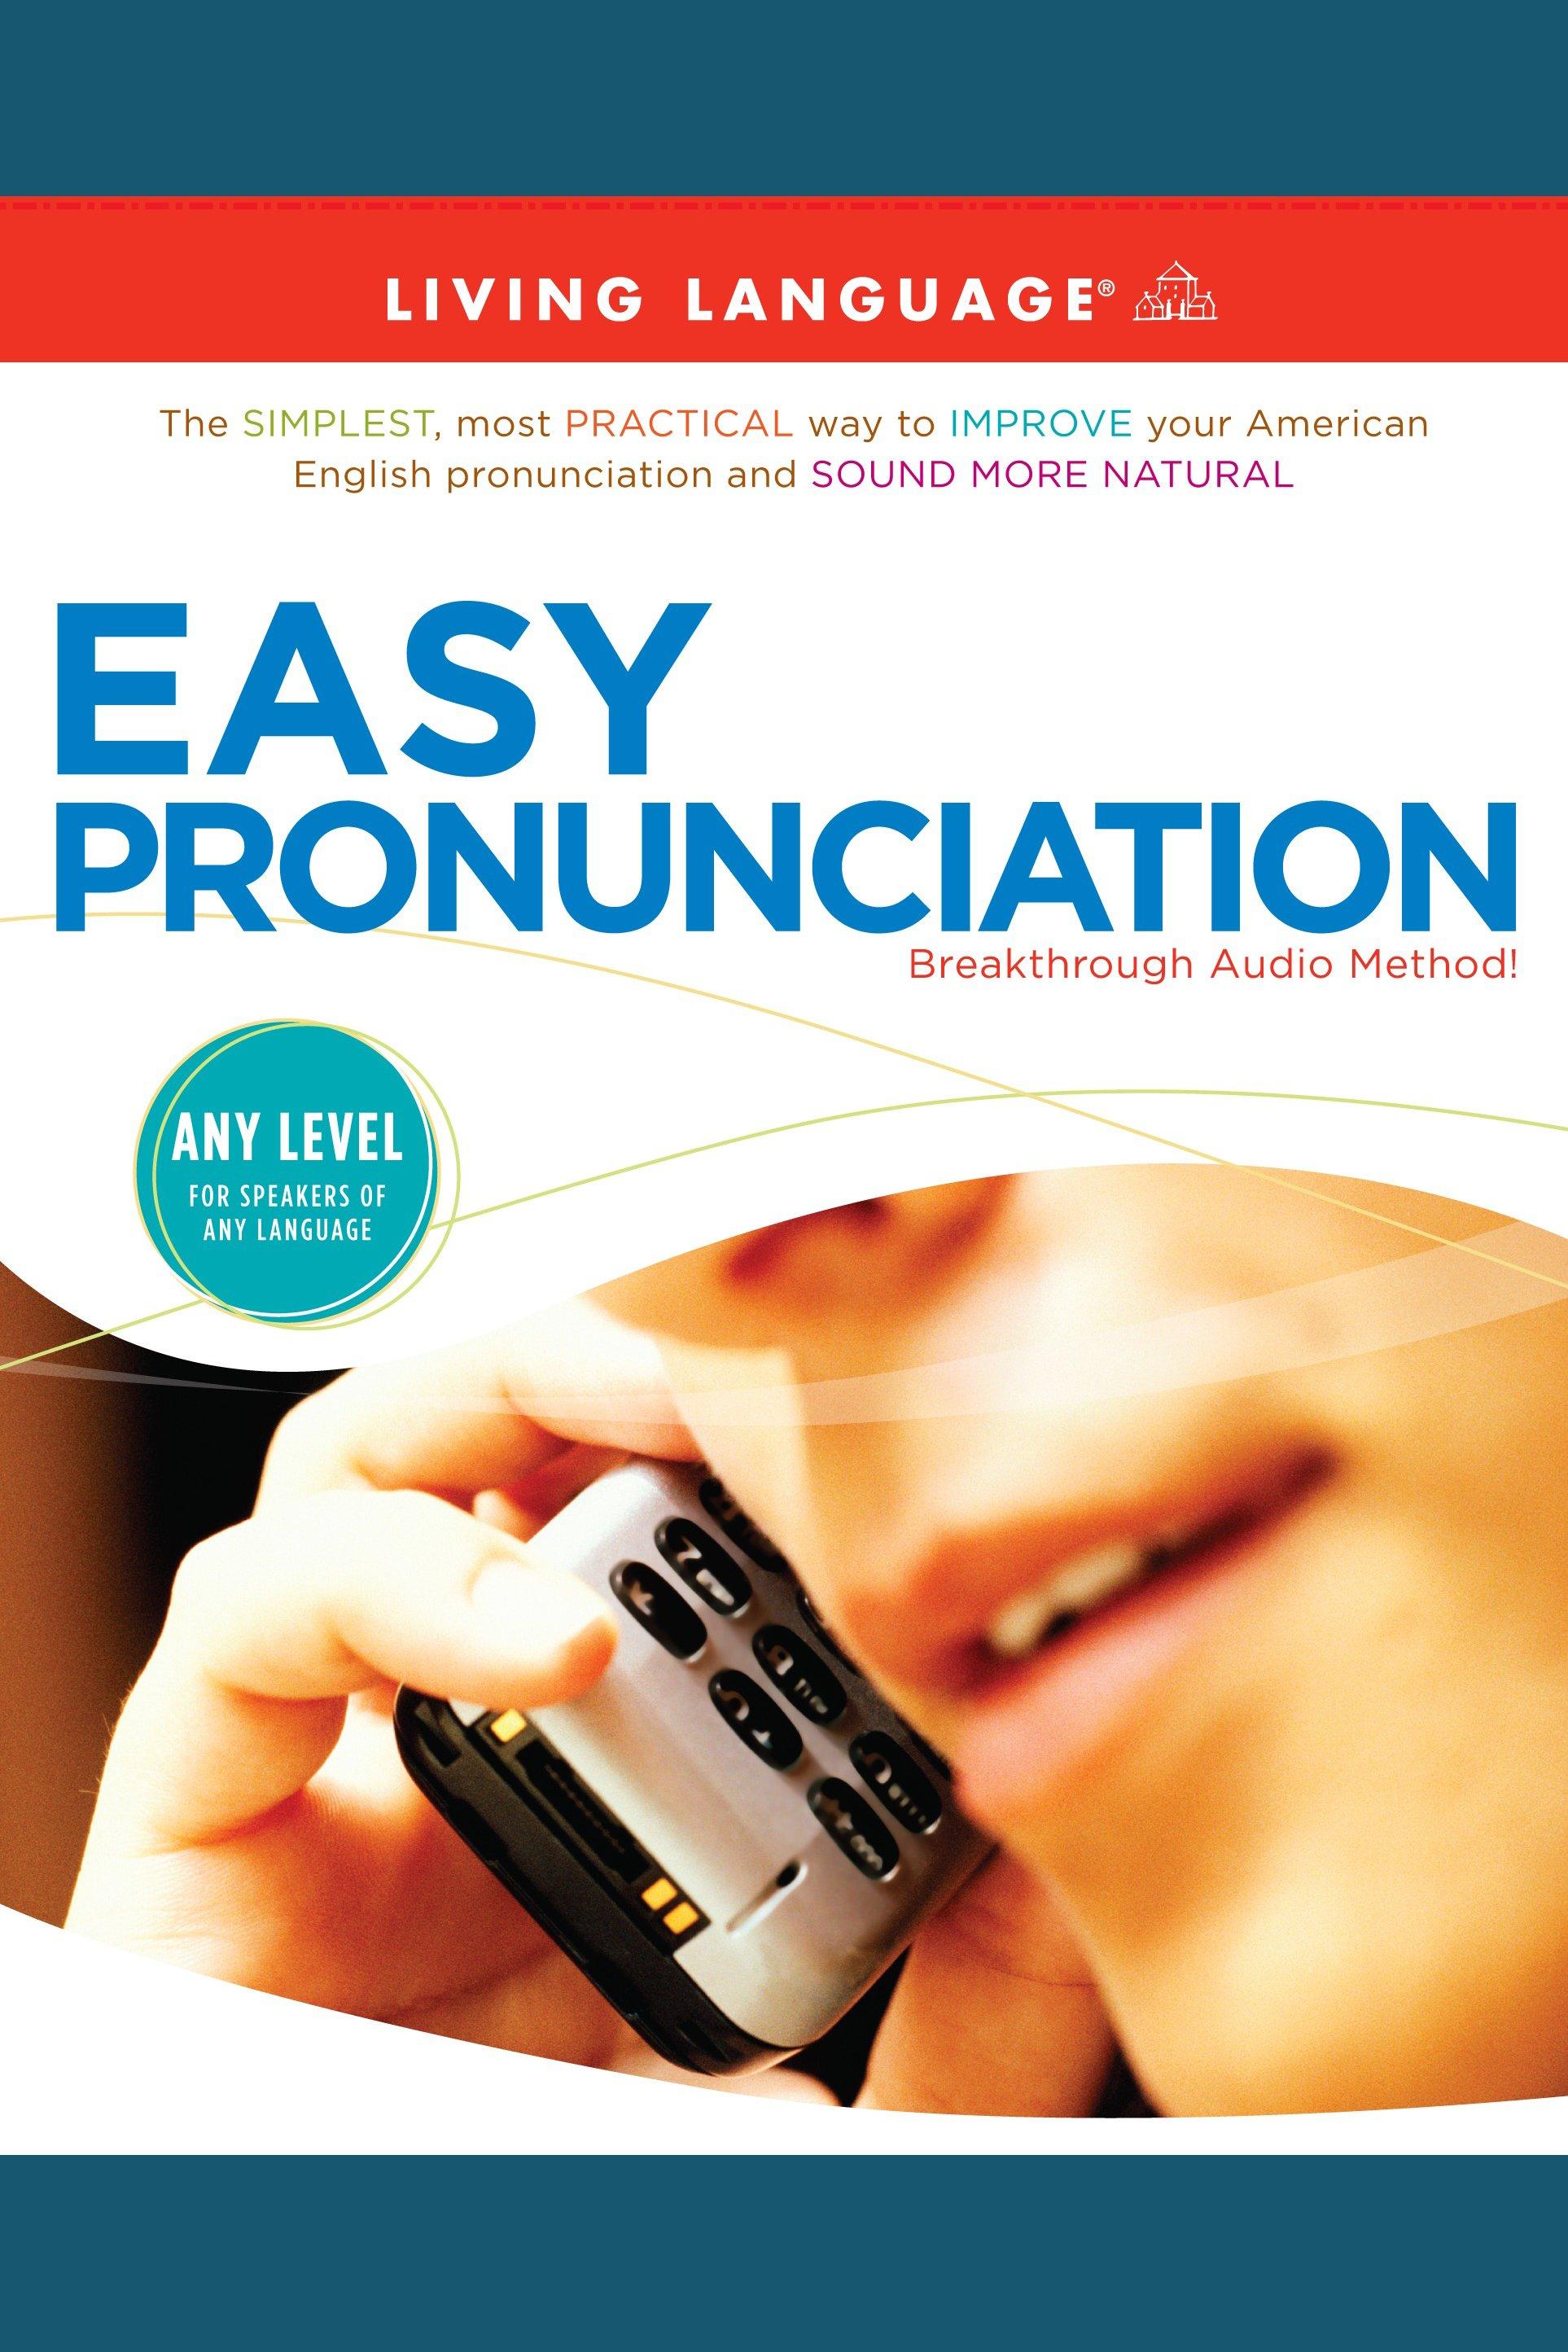 Easy pronunciation cover image